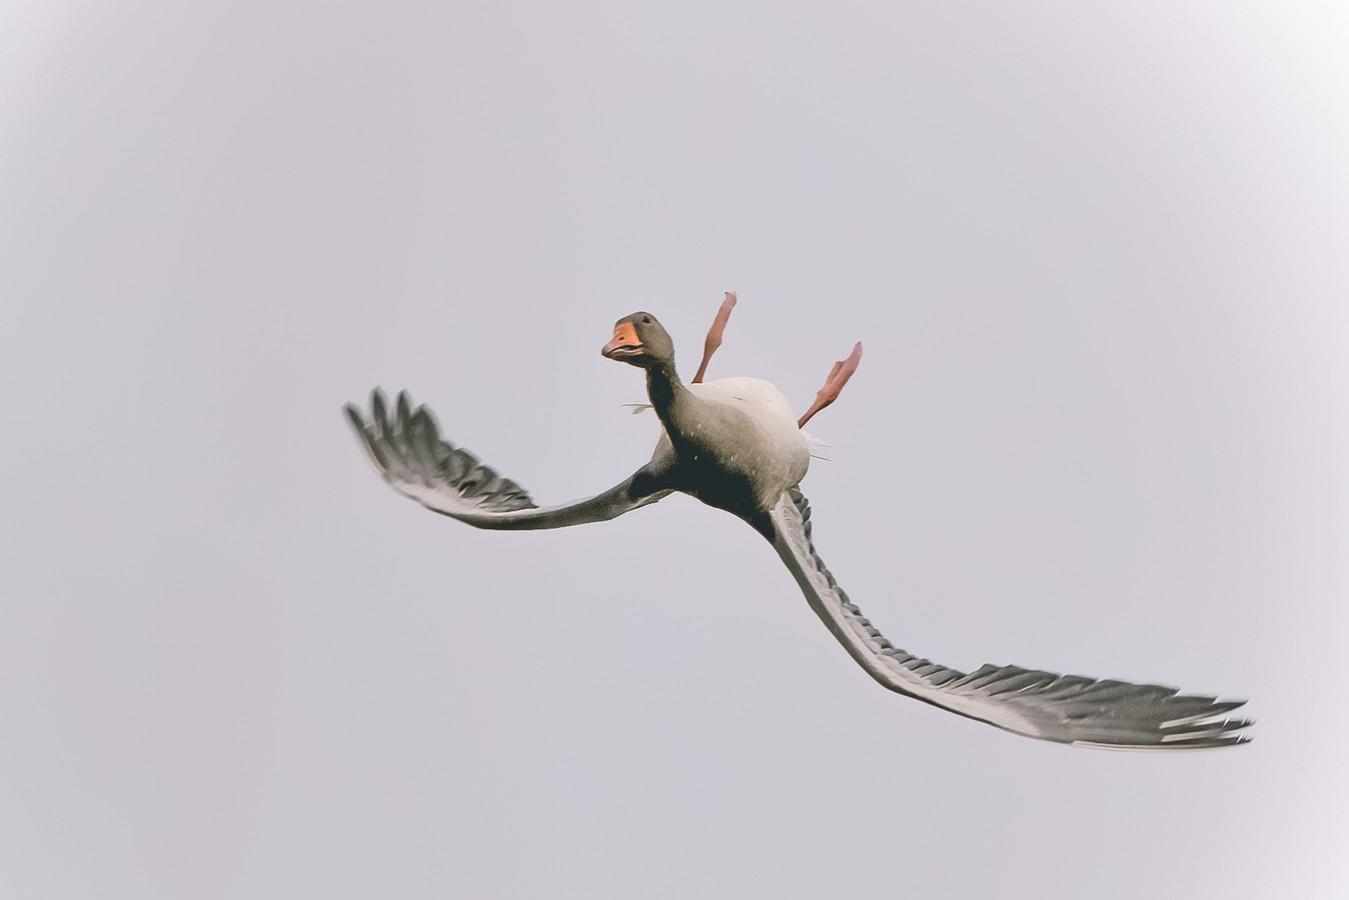 De gans vliegt ondersteboven.